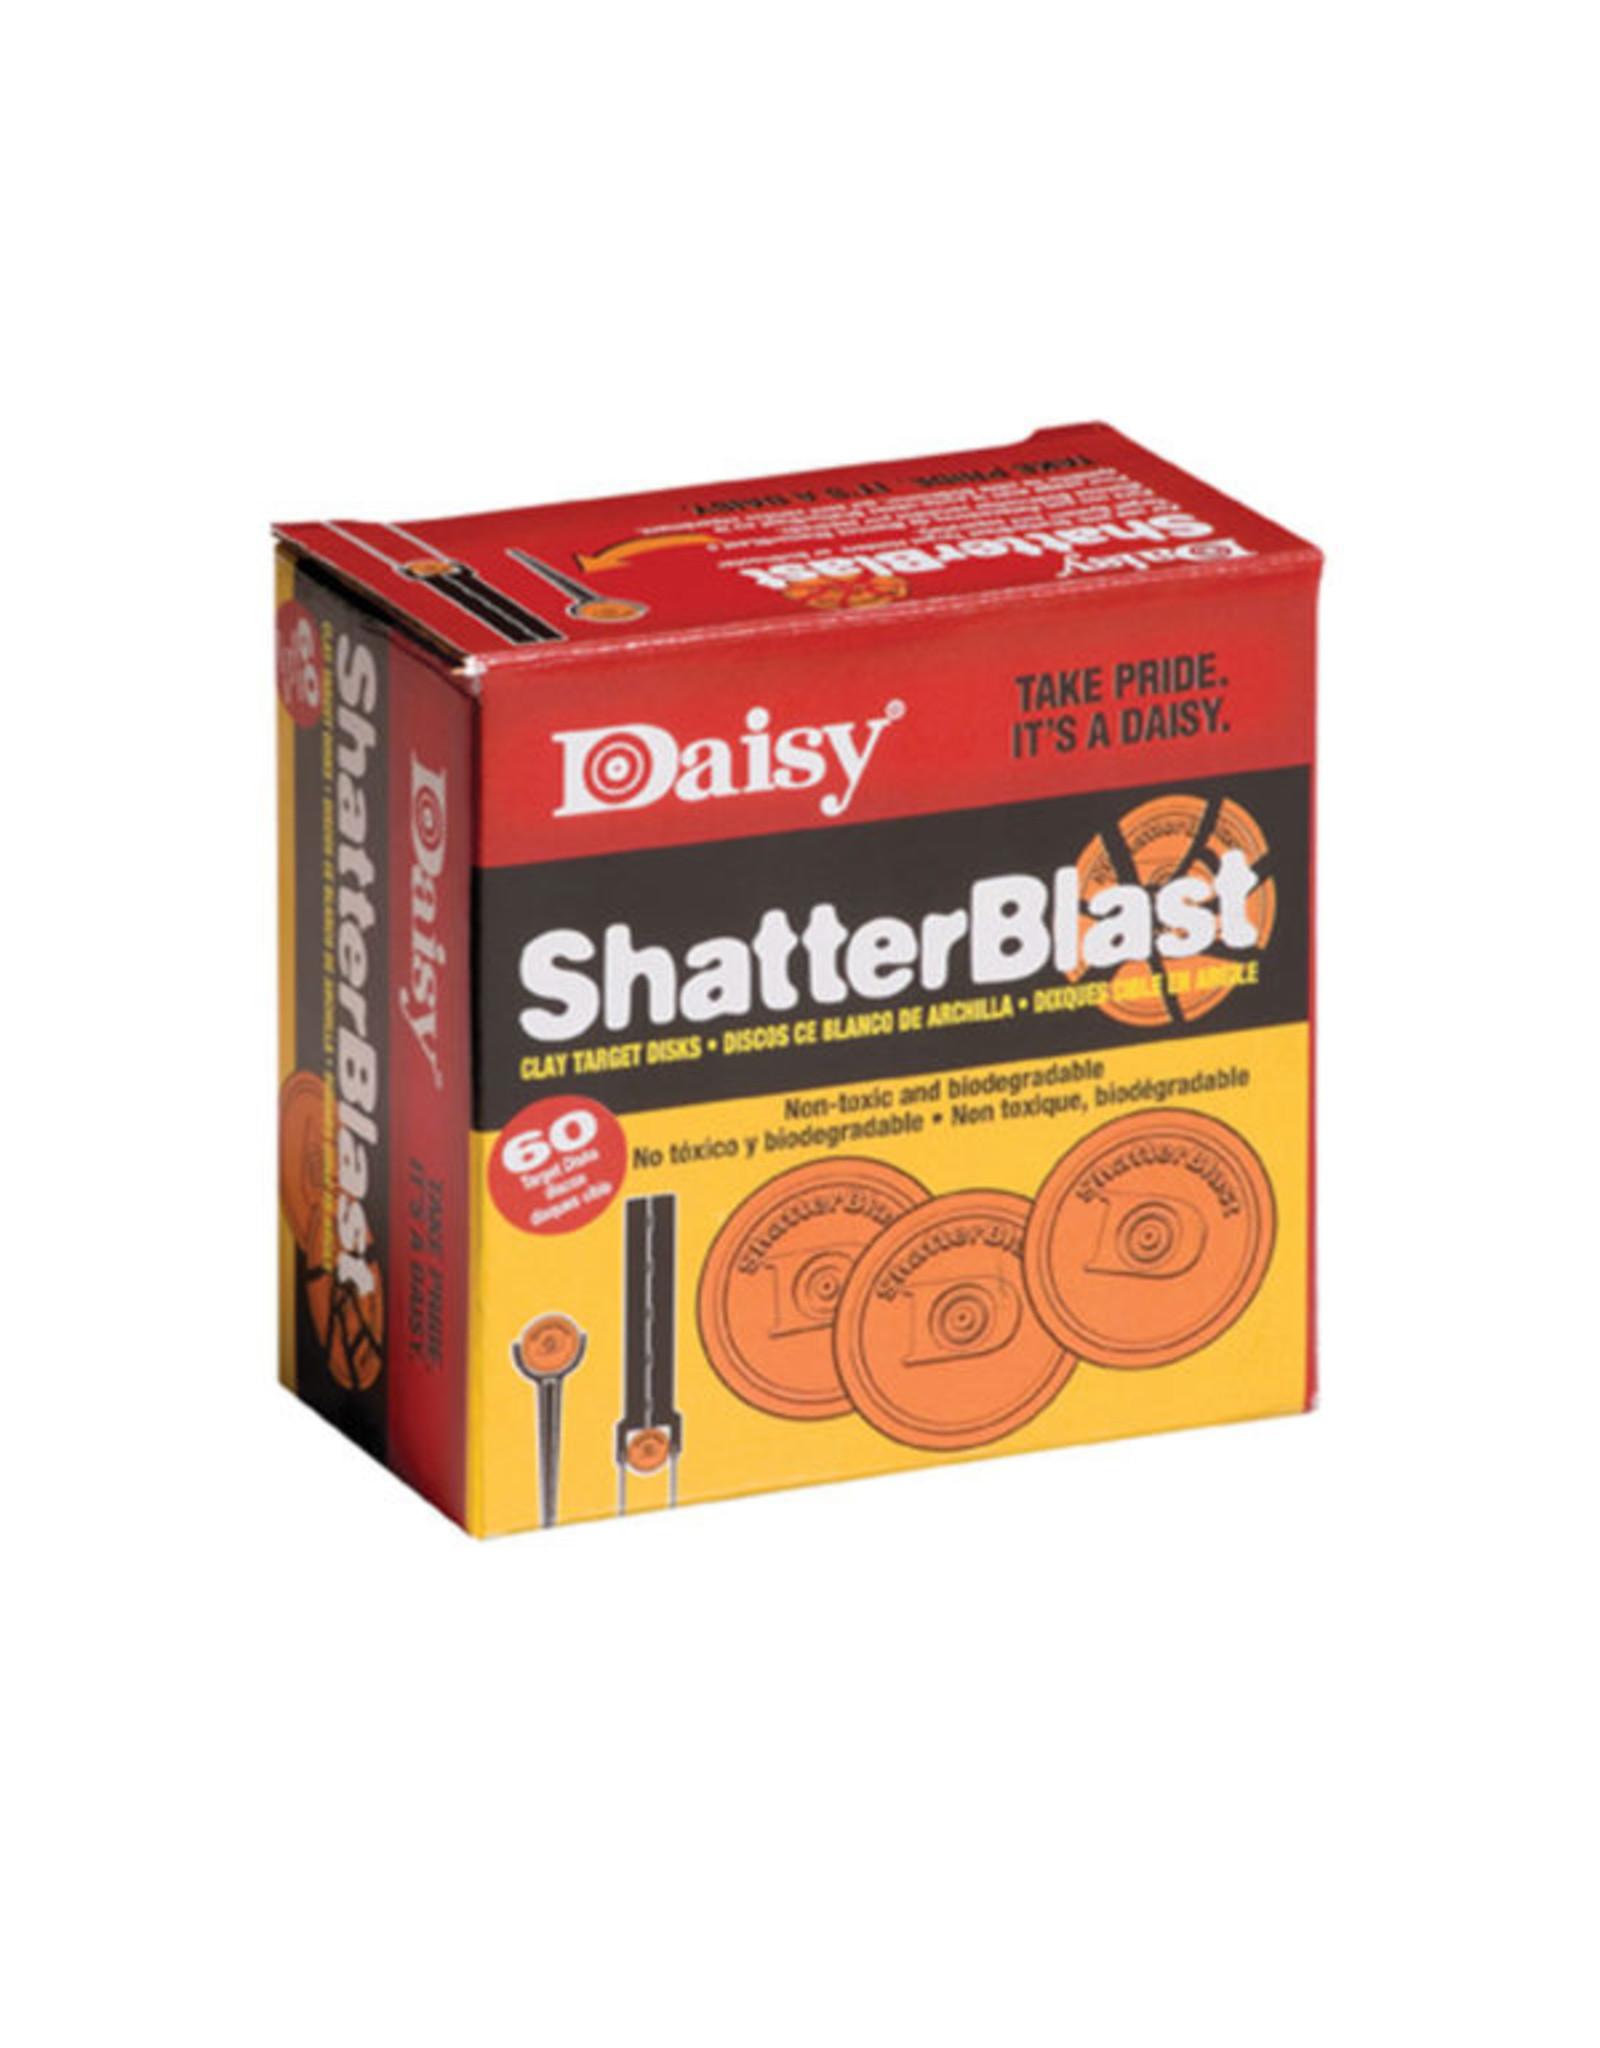 DAISY SHATTER BLAST CLAY TARGETS (60 ct.)